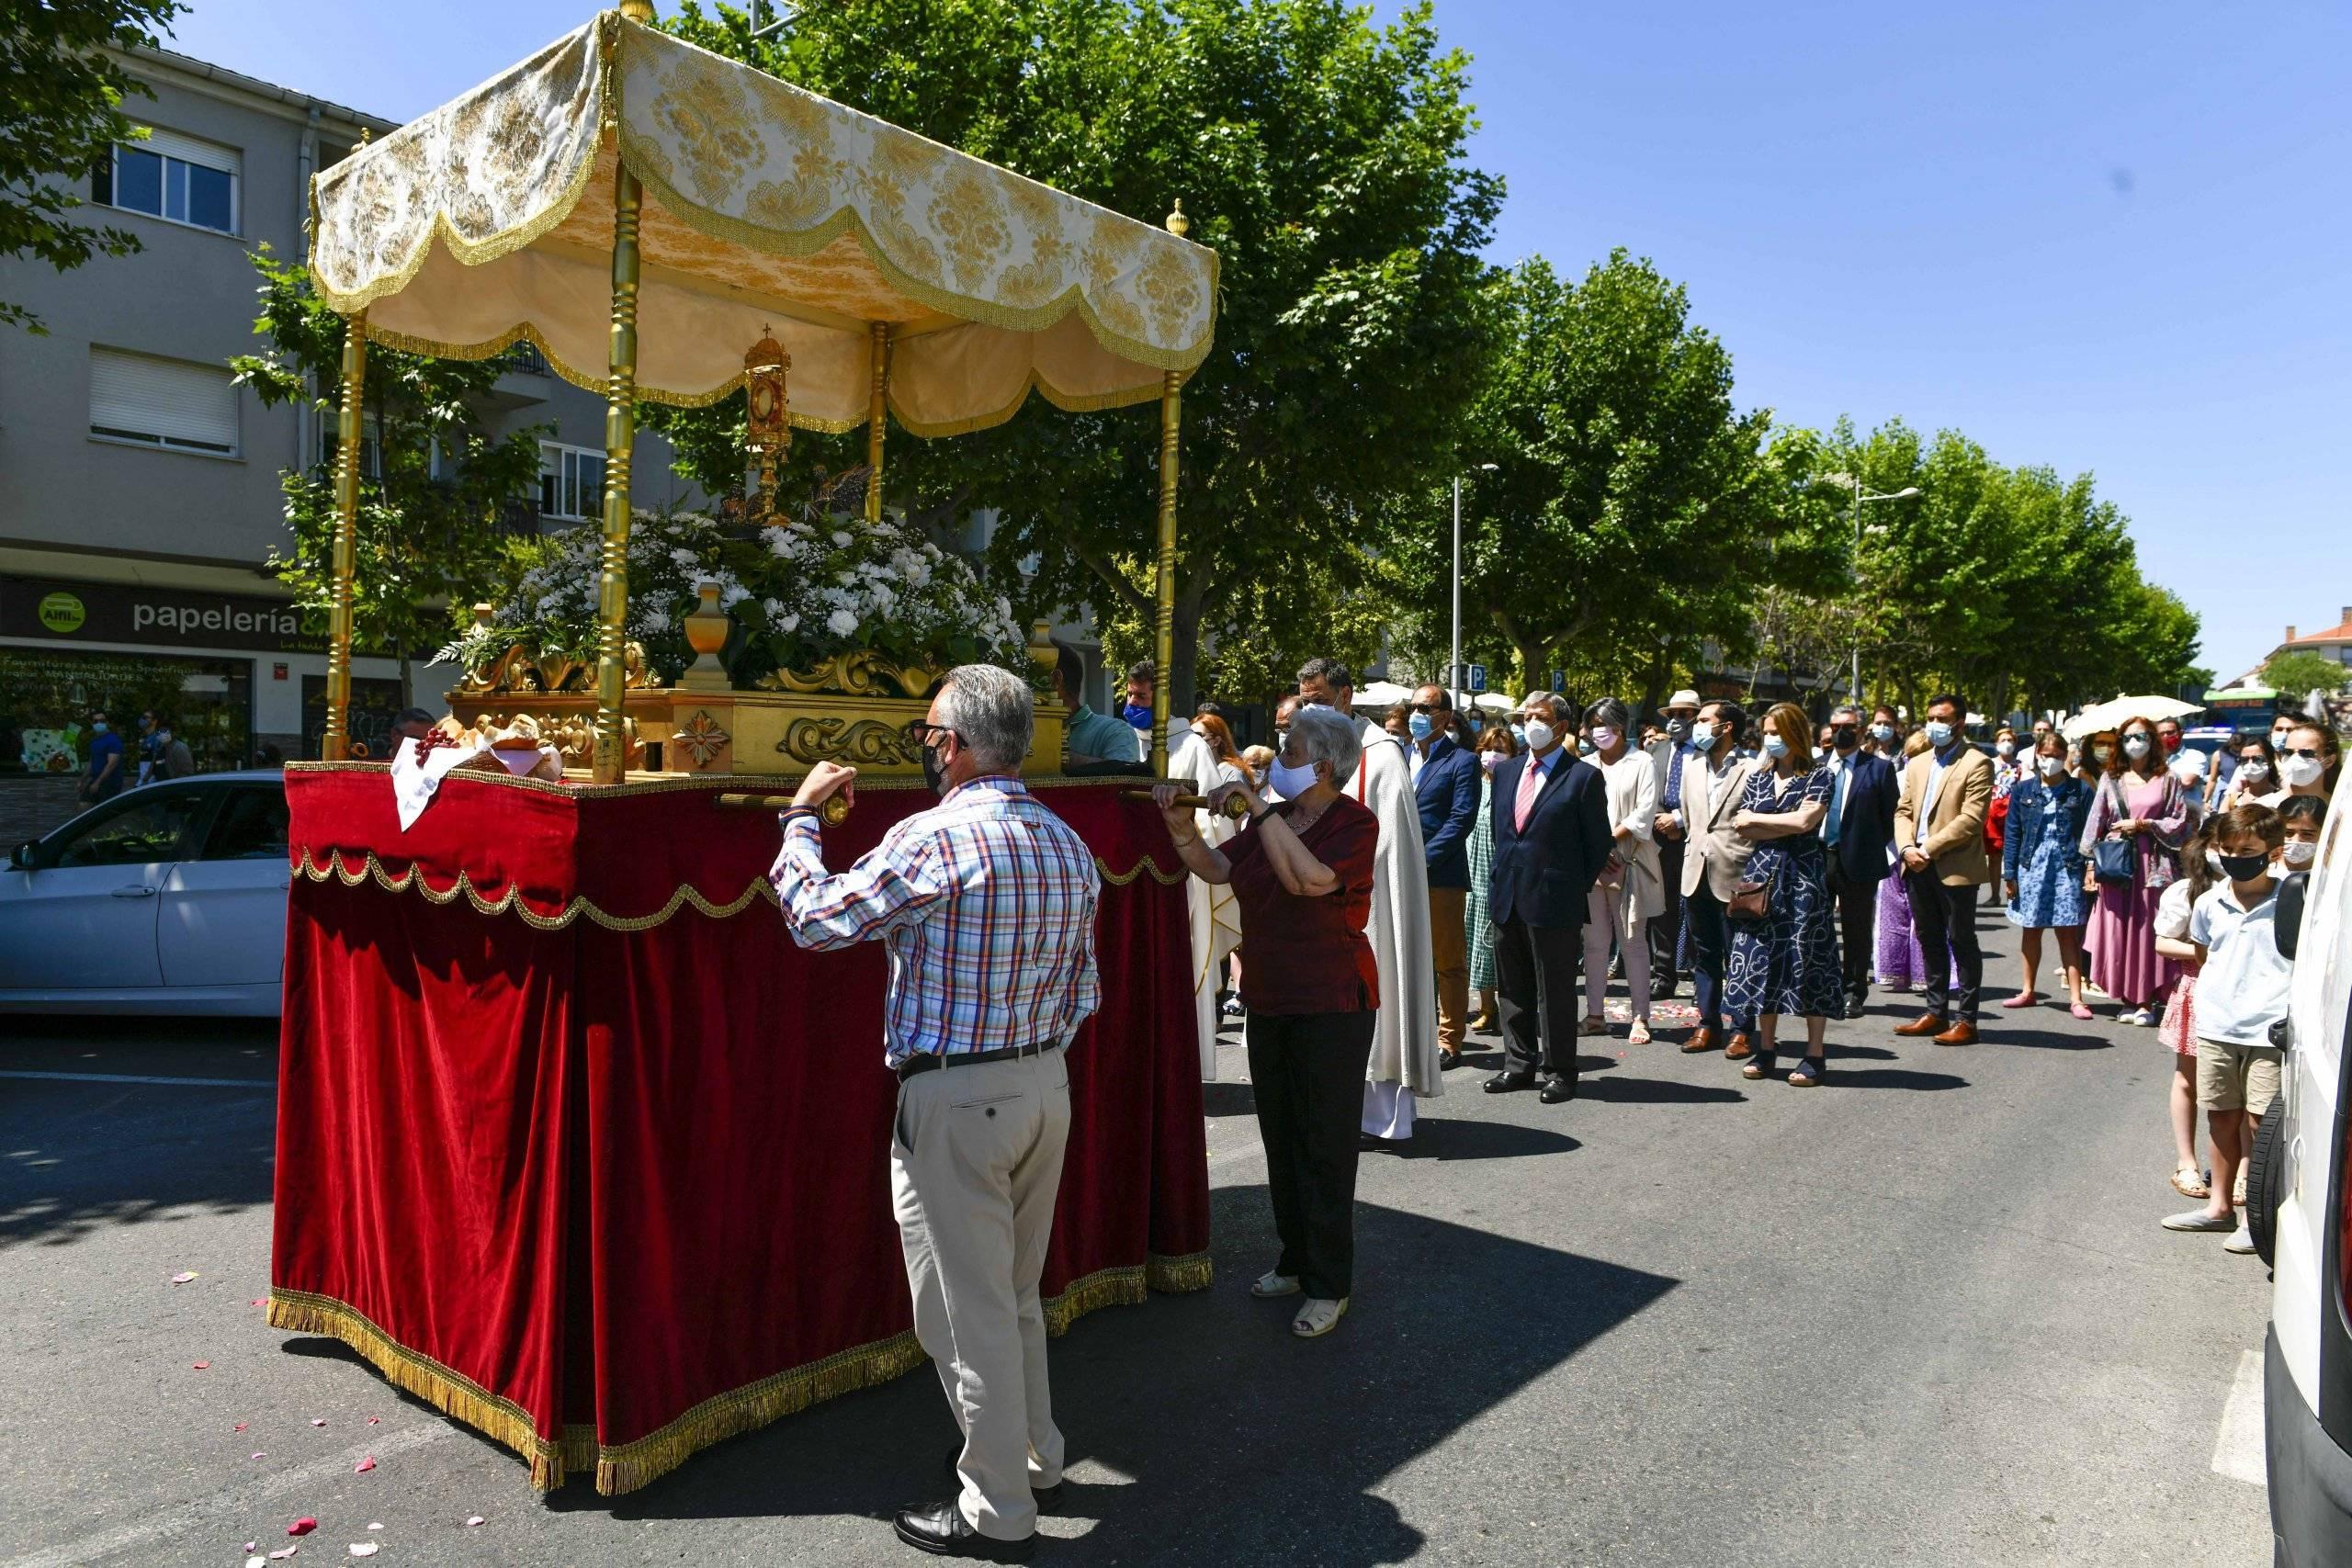 Procesión del Corpus Christi en la calle Cristo.